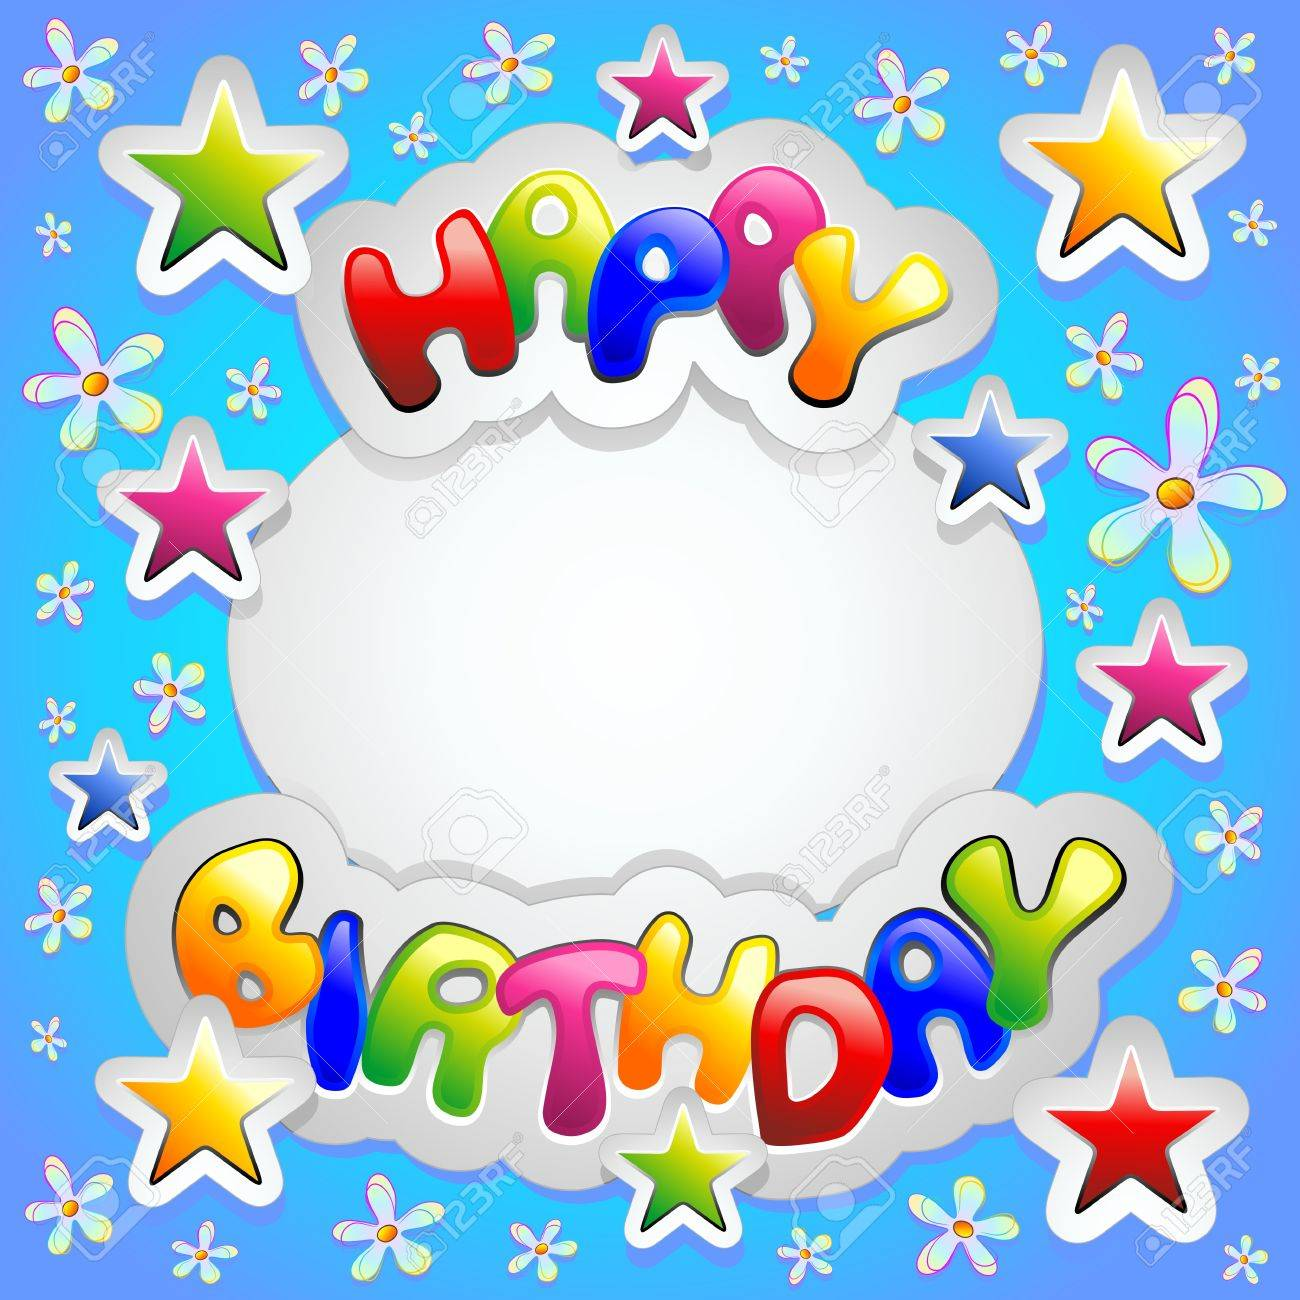 Happy Birthday Celebration Stickers